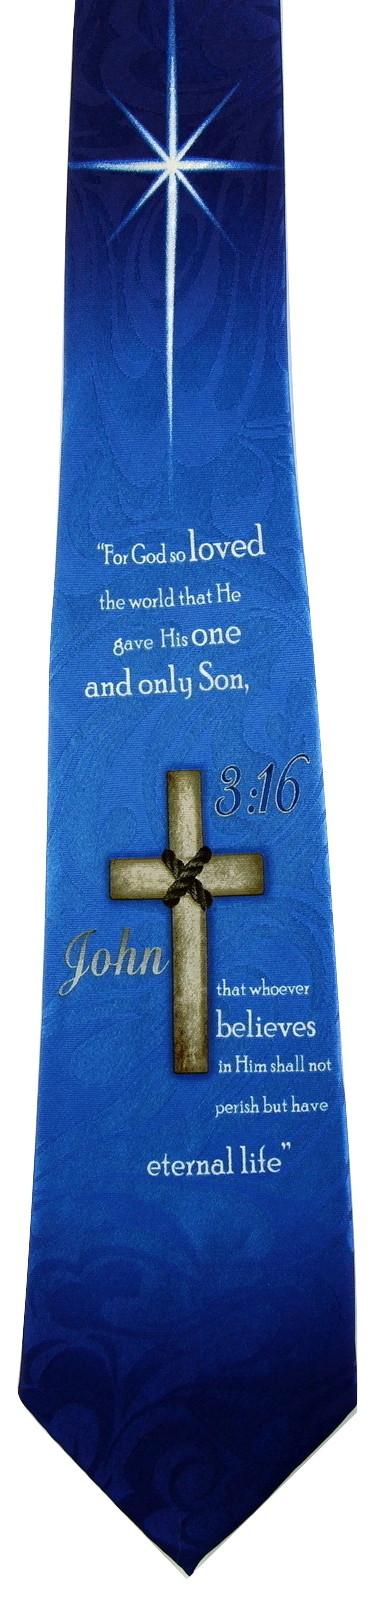 John 3:16 Mens Neck Tie Religious Scripture Christian Jesus Christ Blue Necktie